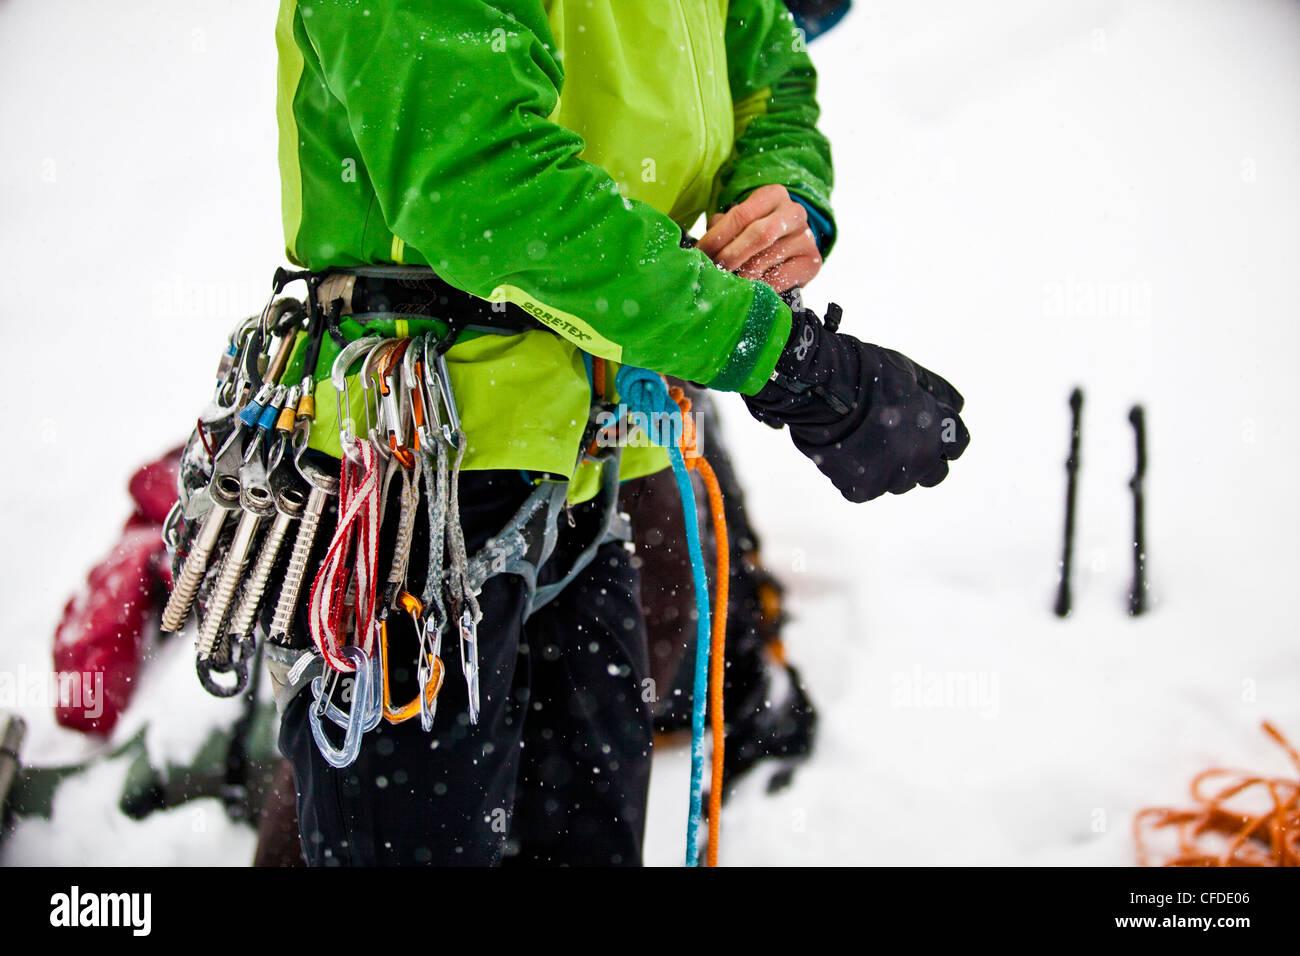 A woman gets ready to ice climb Moonlight WI4, Even Thomas Creek, Kananaskis, Alberta, Canada - Stock Image